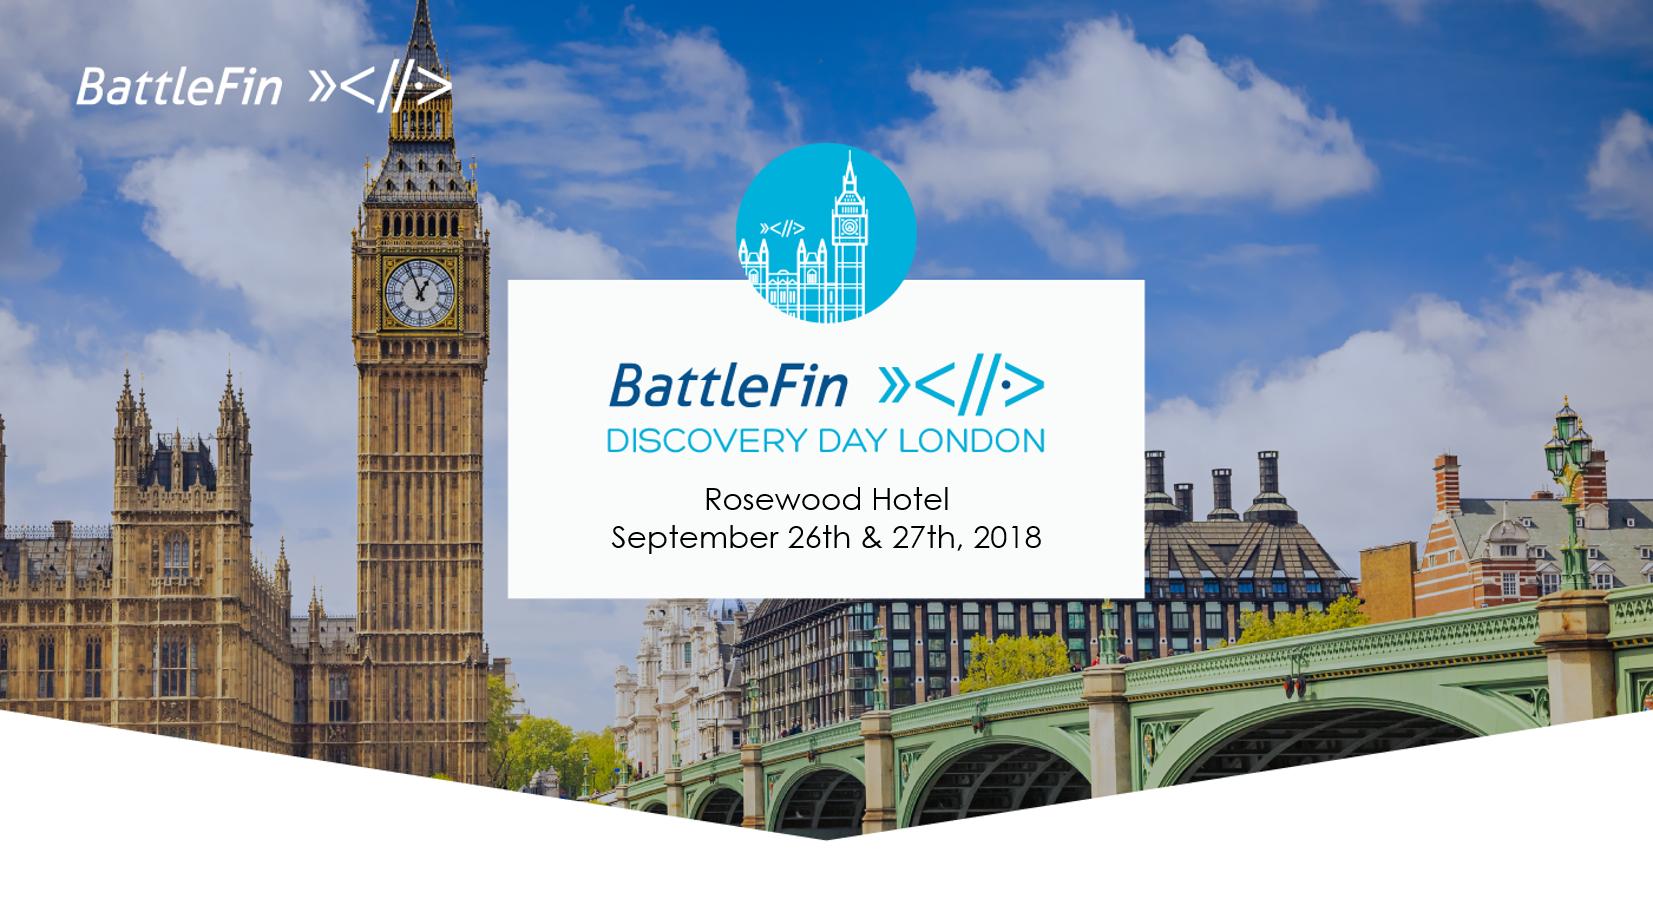 london battlefin